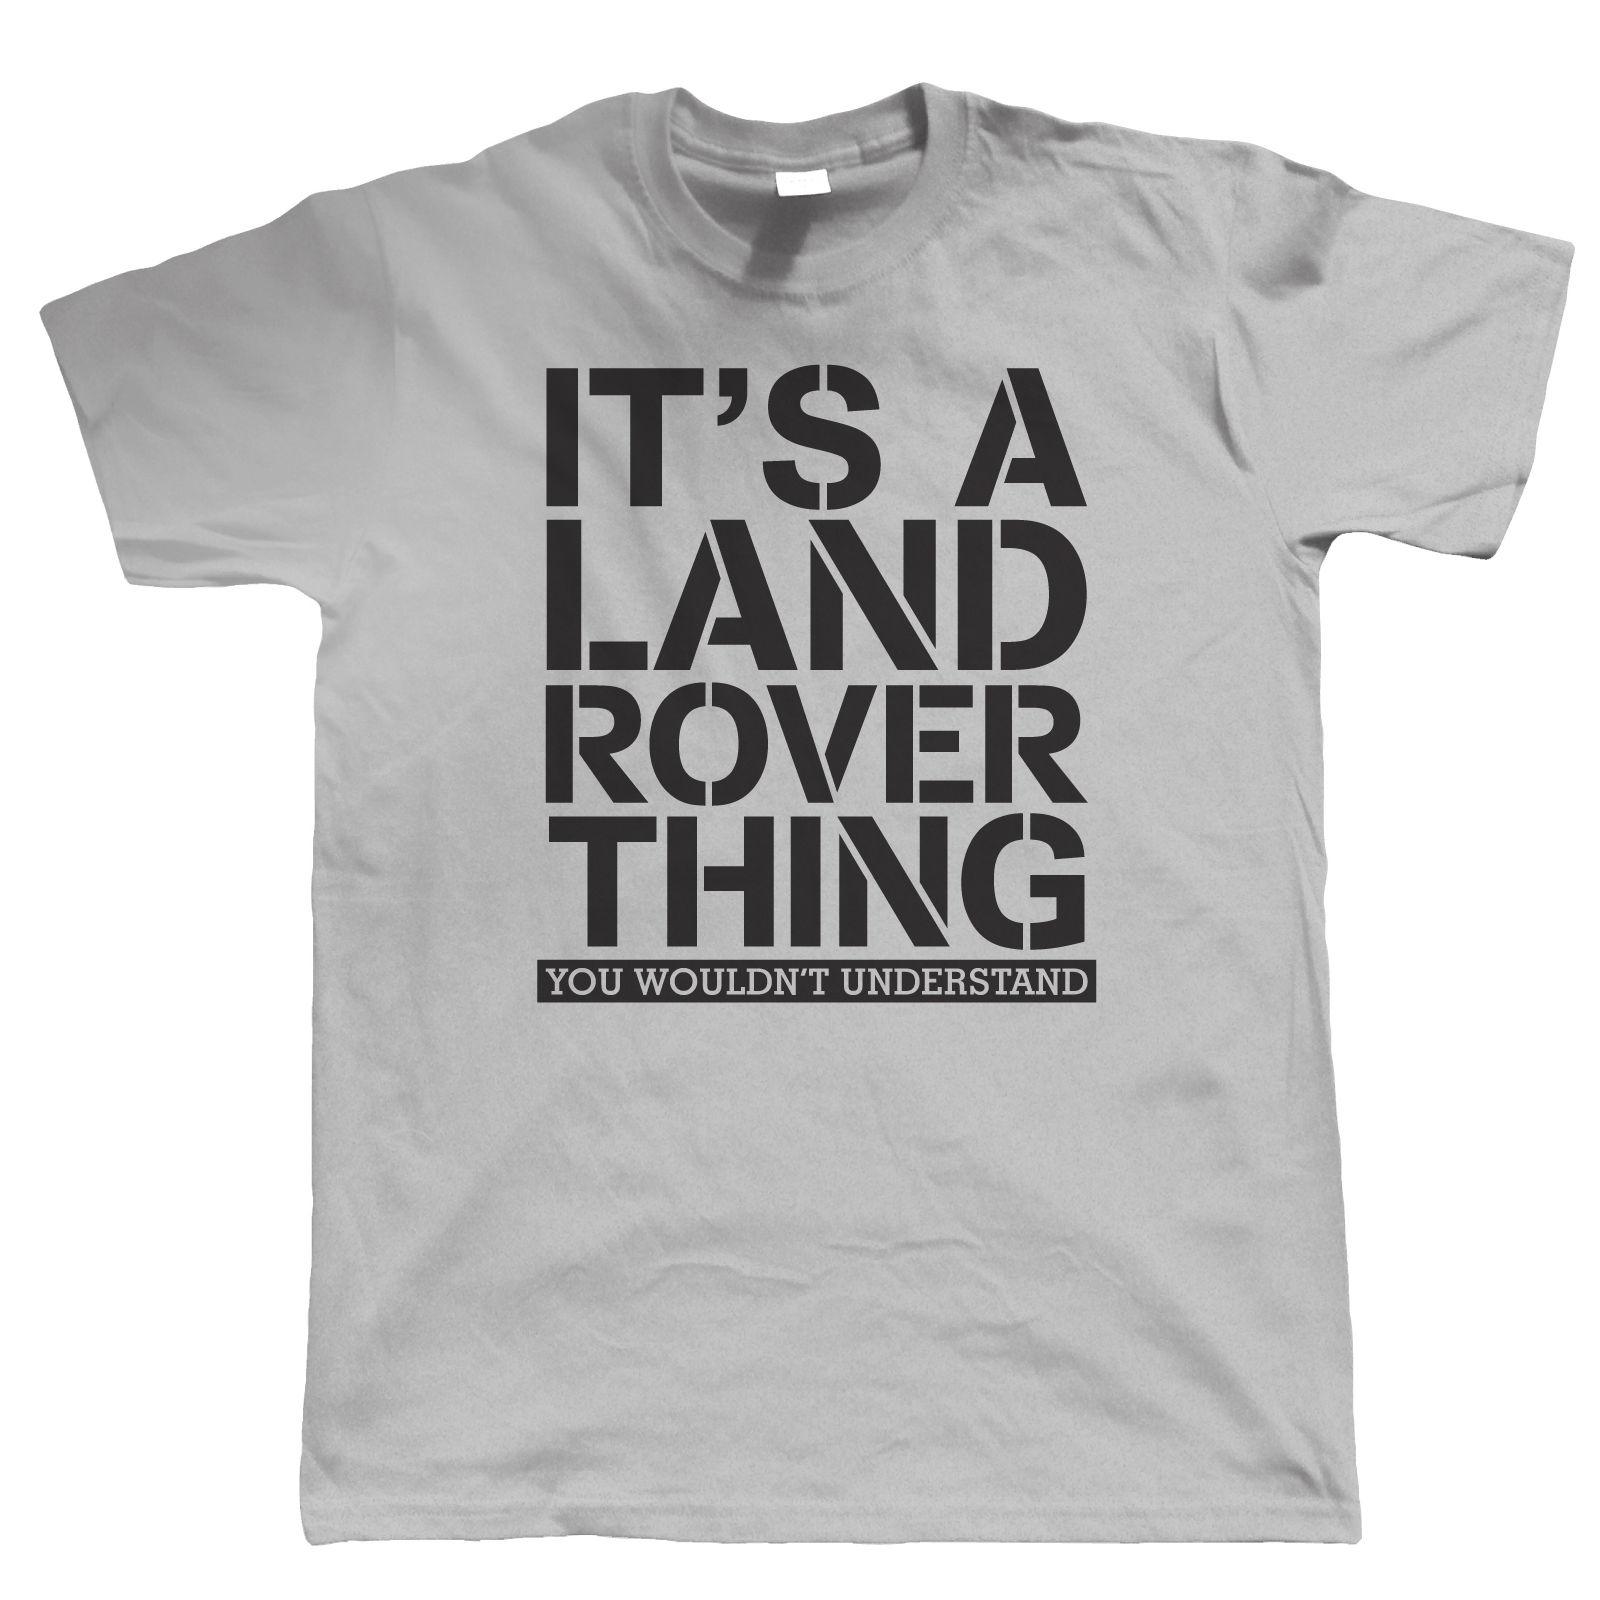 colors multiple shirt series ii rover land iii british i men sizes bhp landrover ebay t shirts